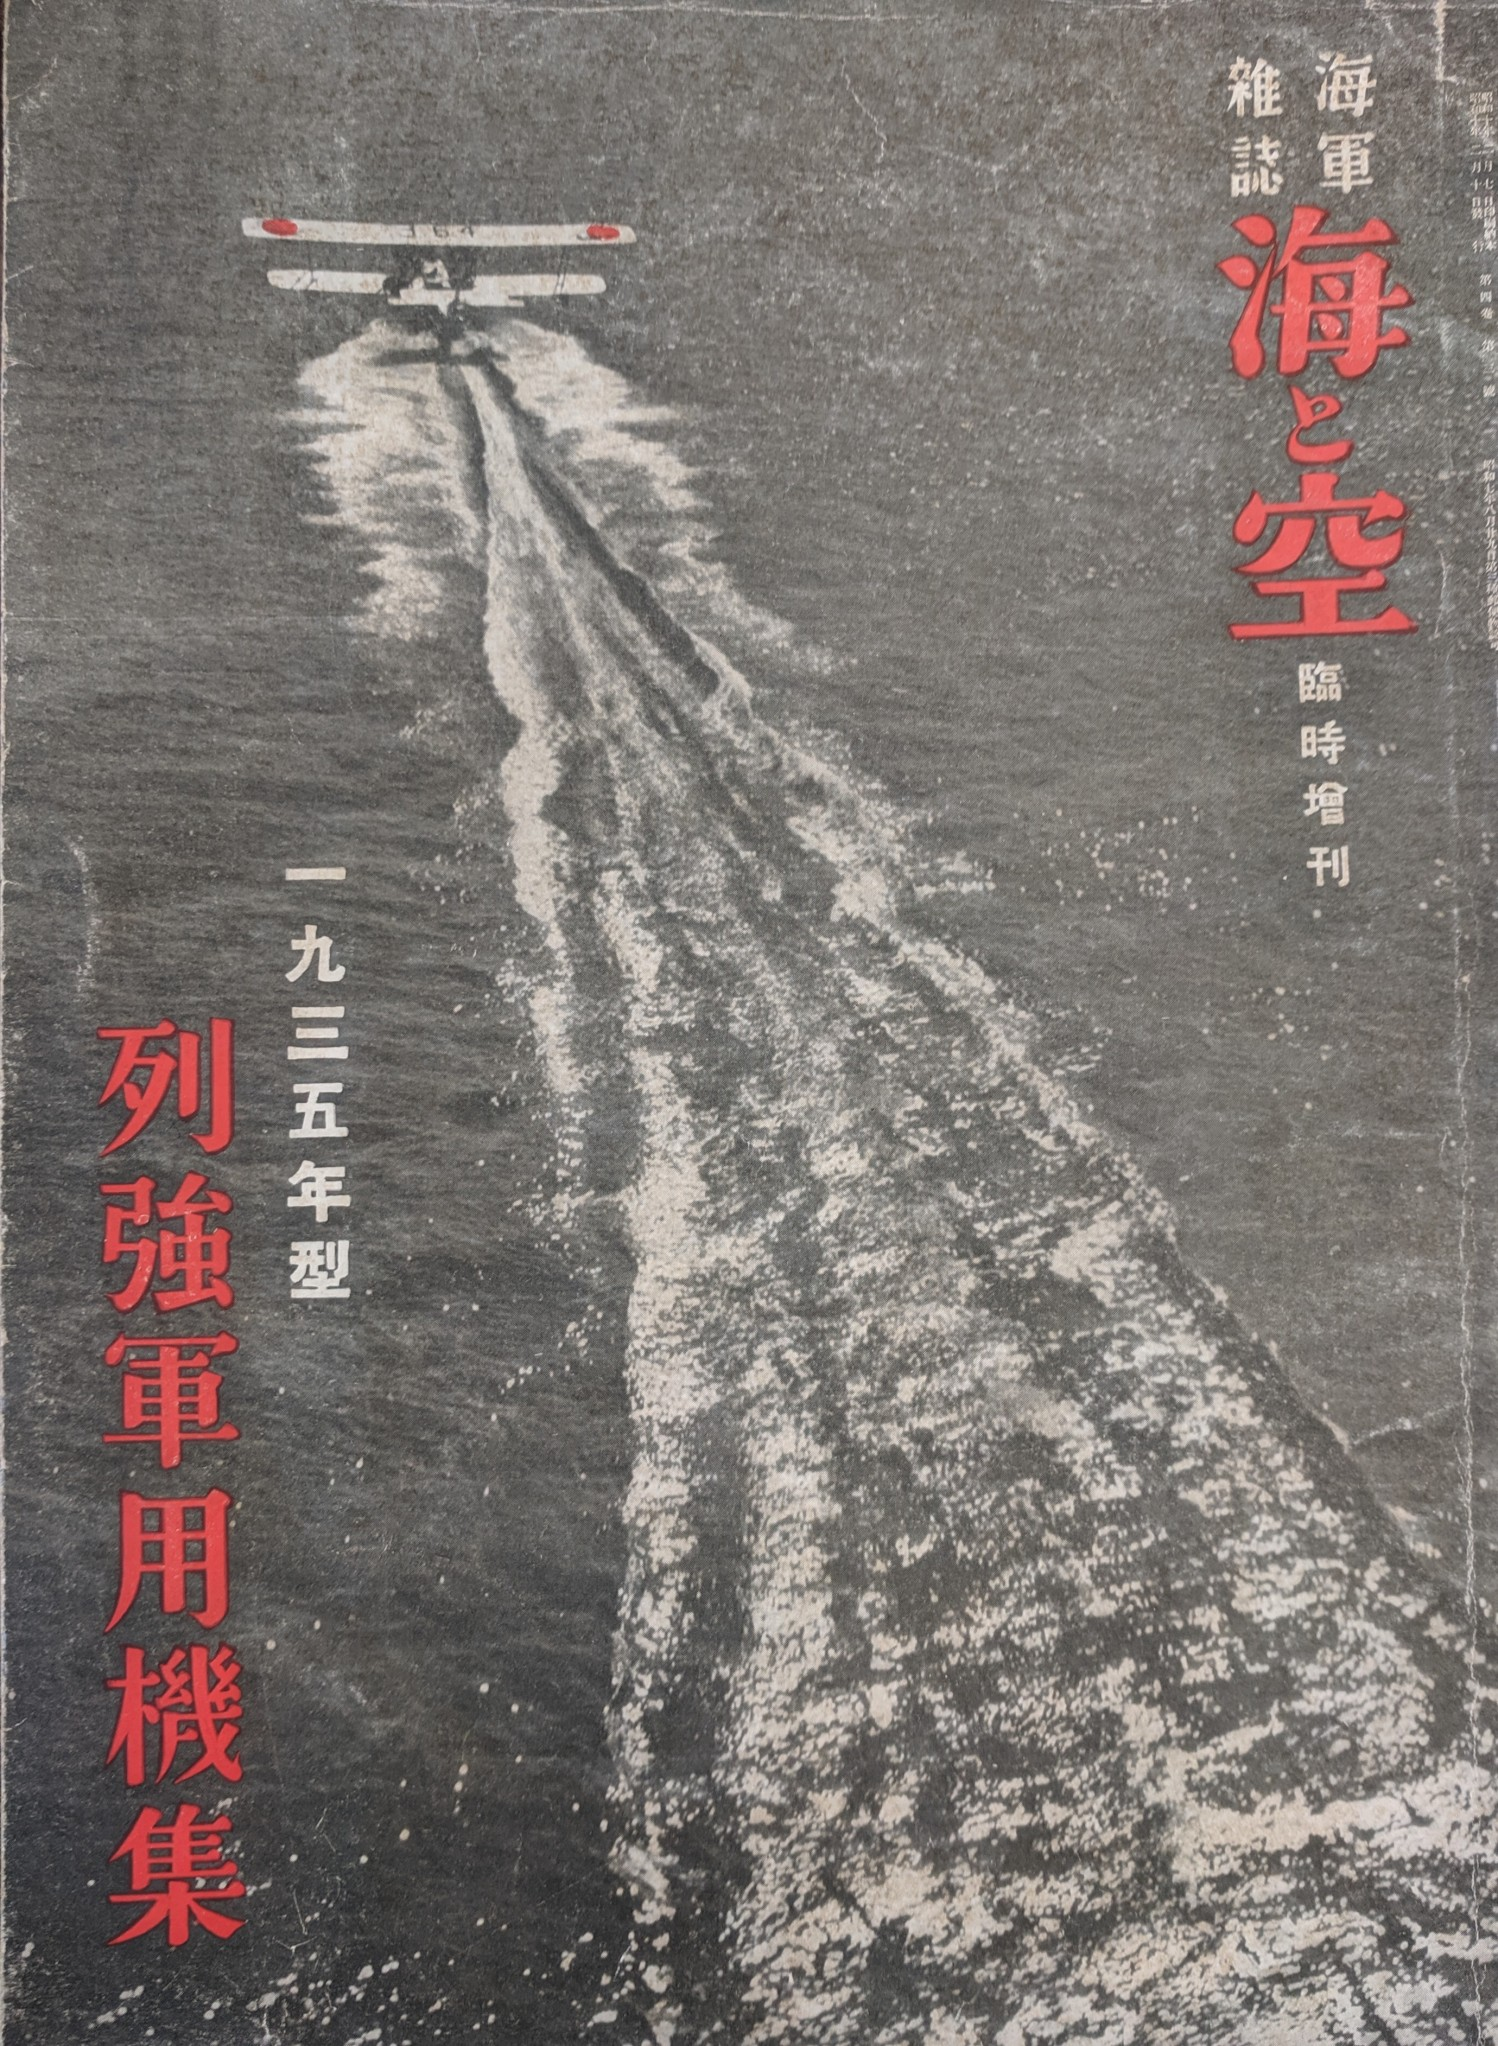 Sora to Umi, February 1935